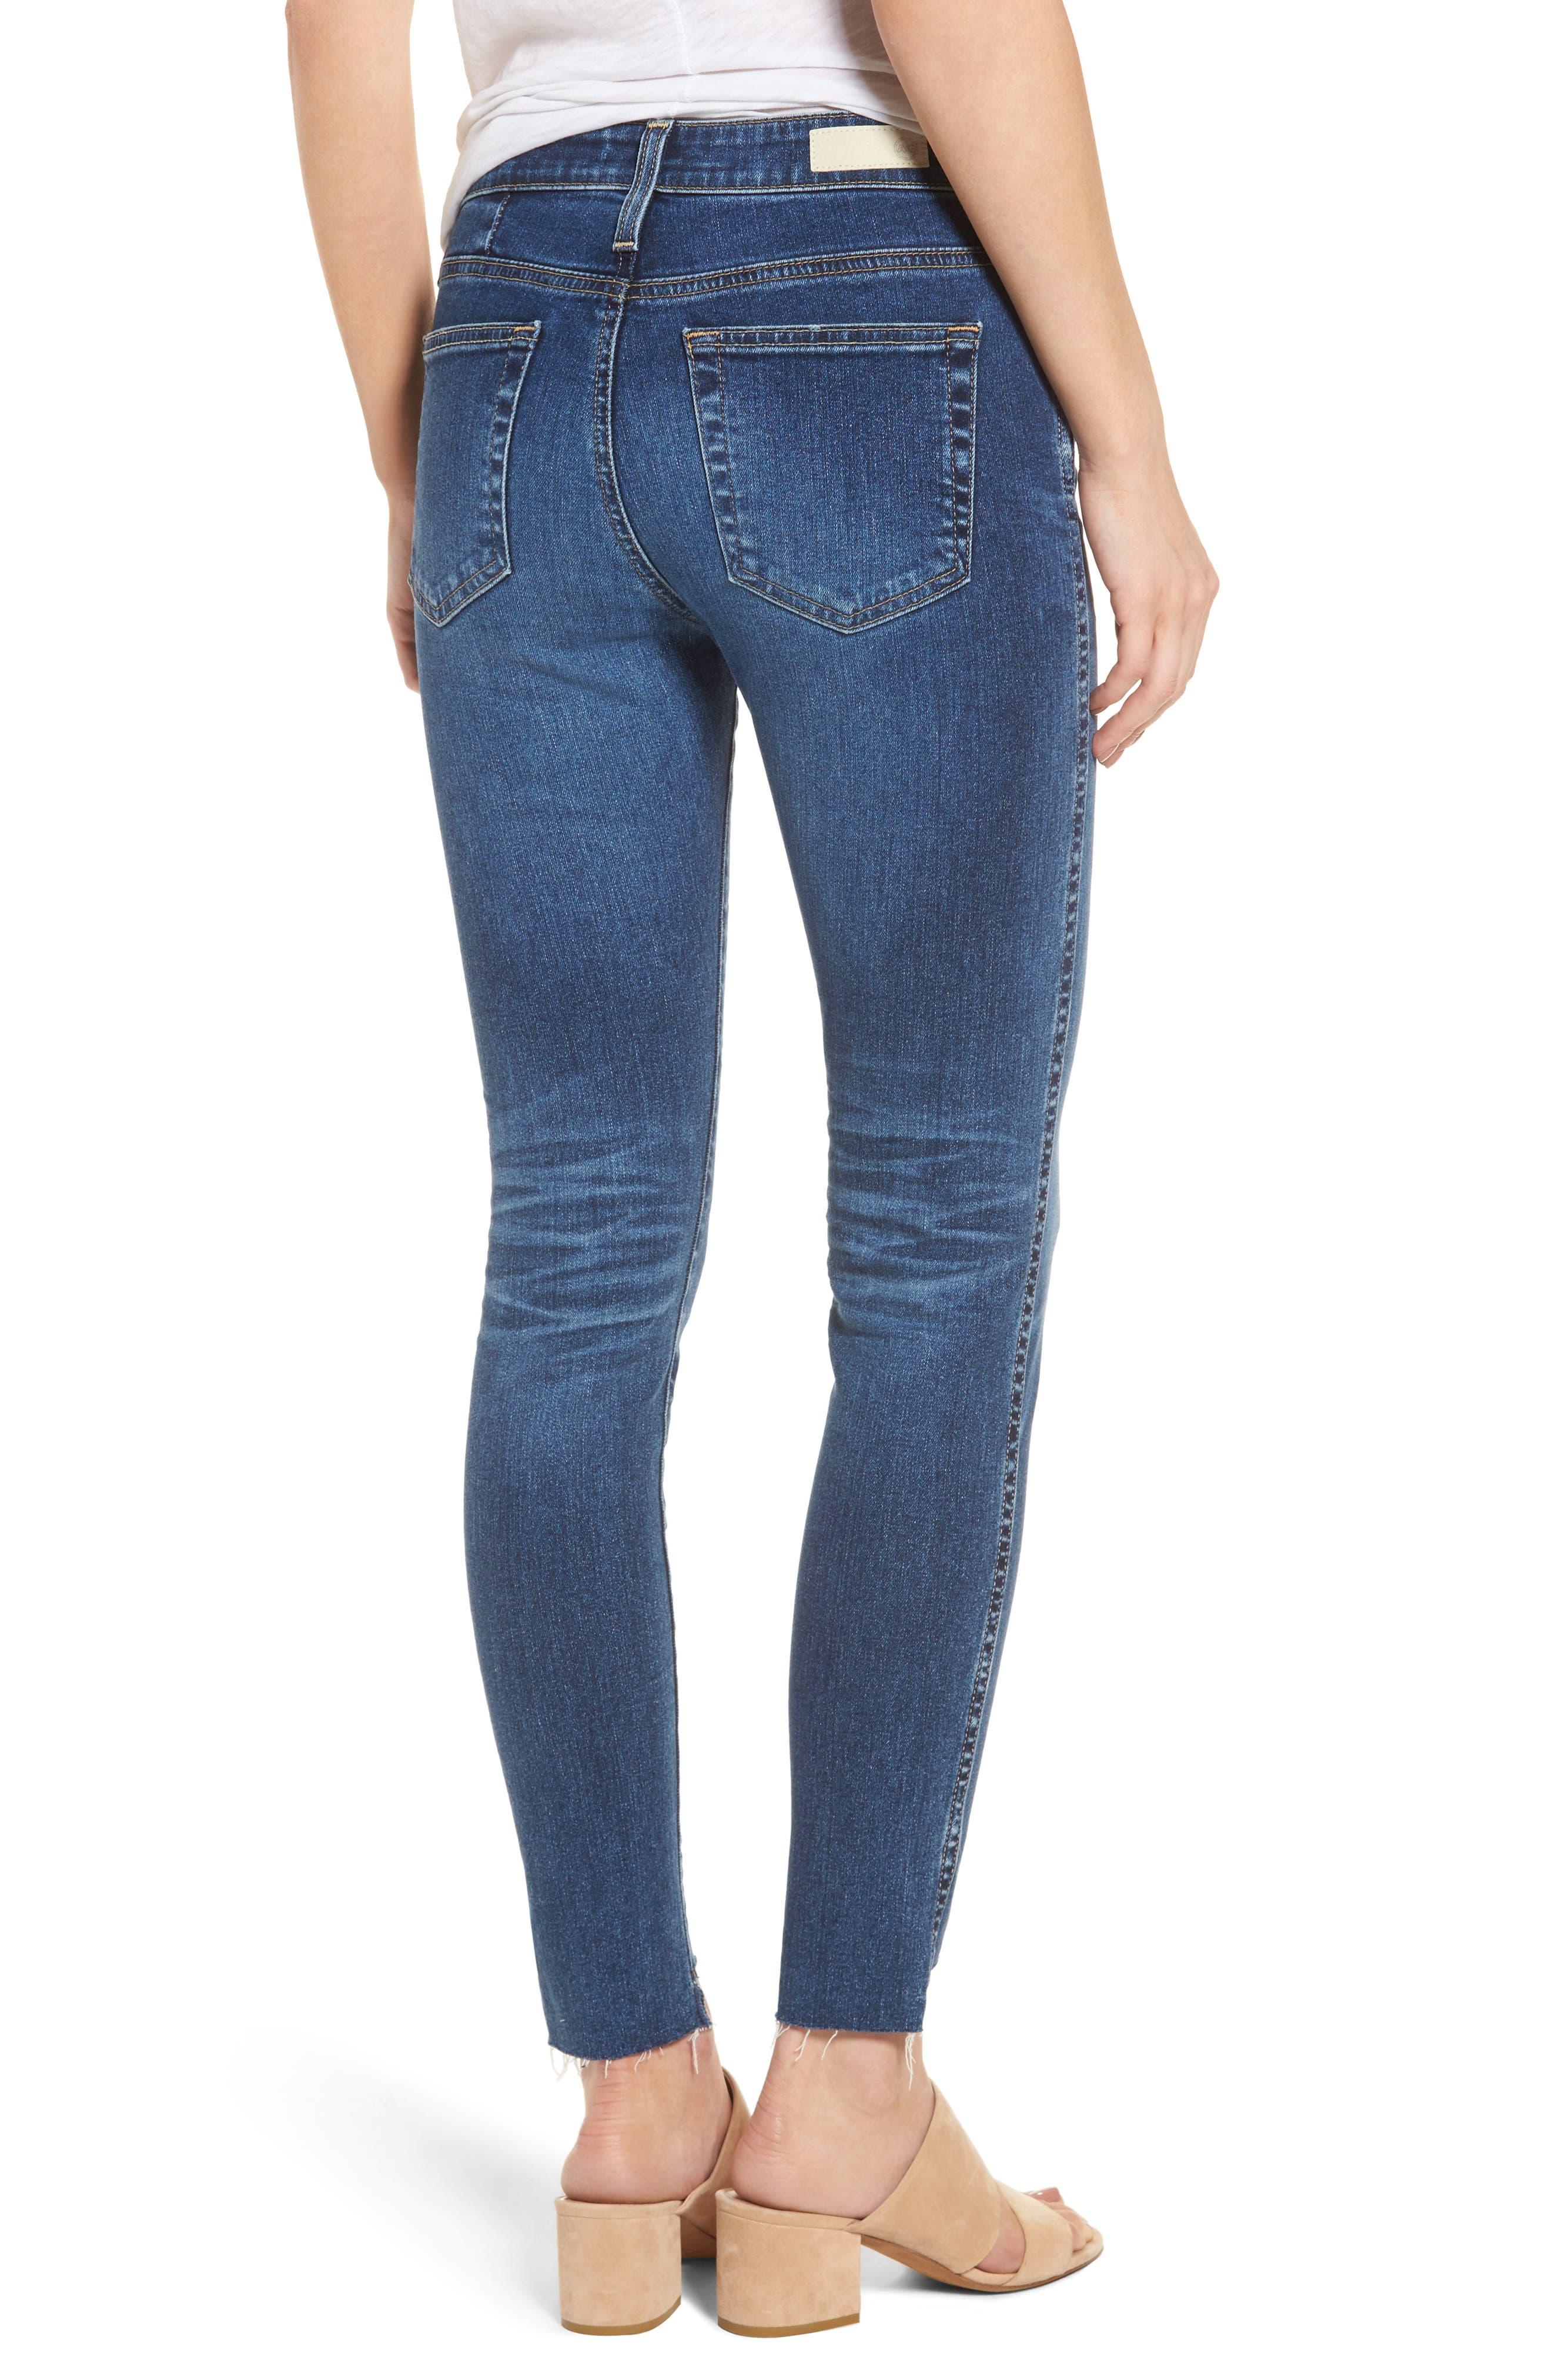 Alternate Image 2  - AG The High Rise Farrah Ankle Skinny Jeans (10 Years Rhythmic Blue)